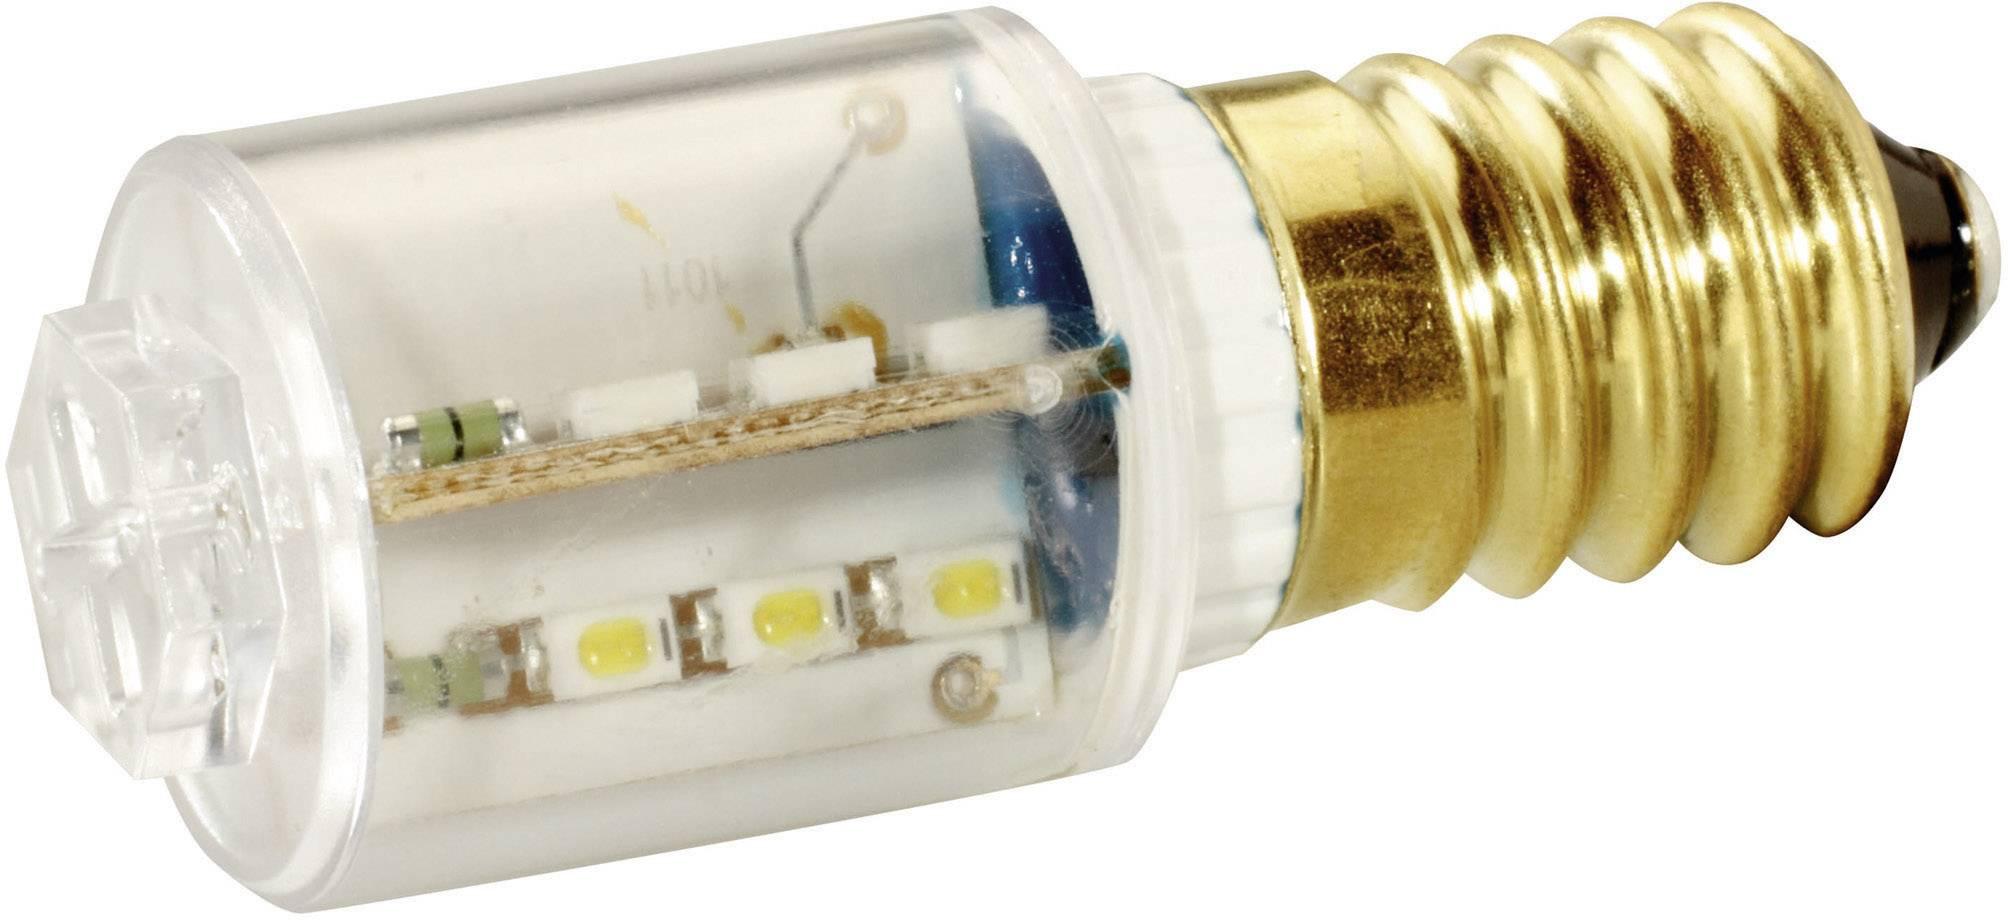 LEDžiarovka Signal Construct MBRE141278, E14, 230 V/DC, 230 V/AC, 7500 mlm, zelená